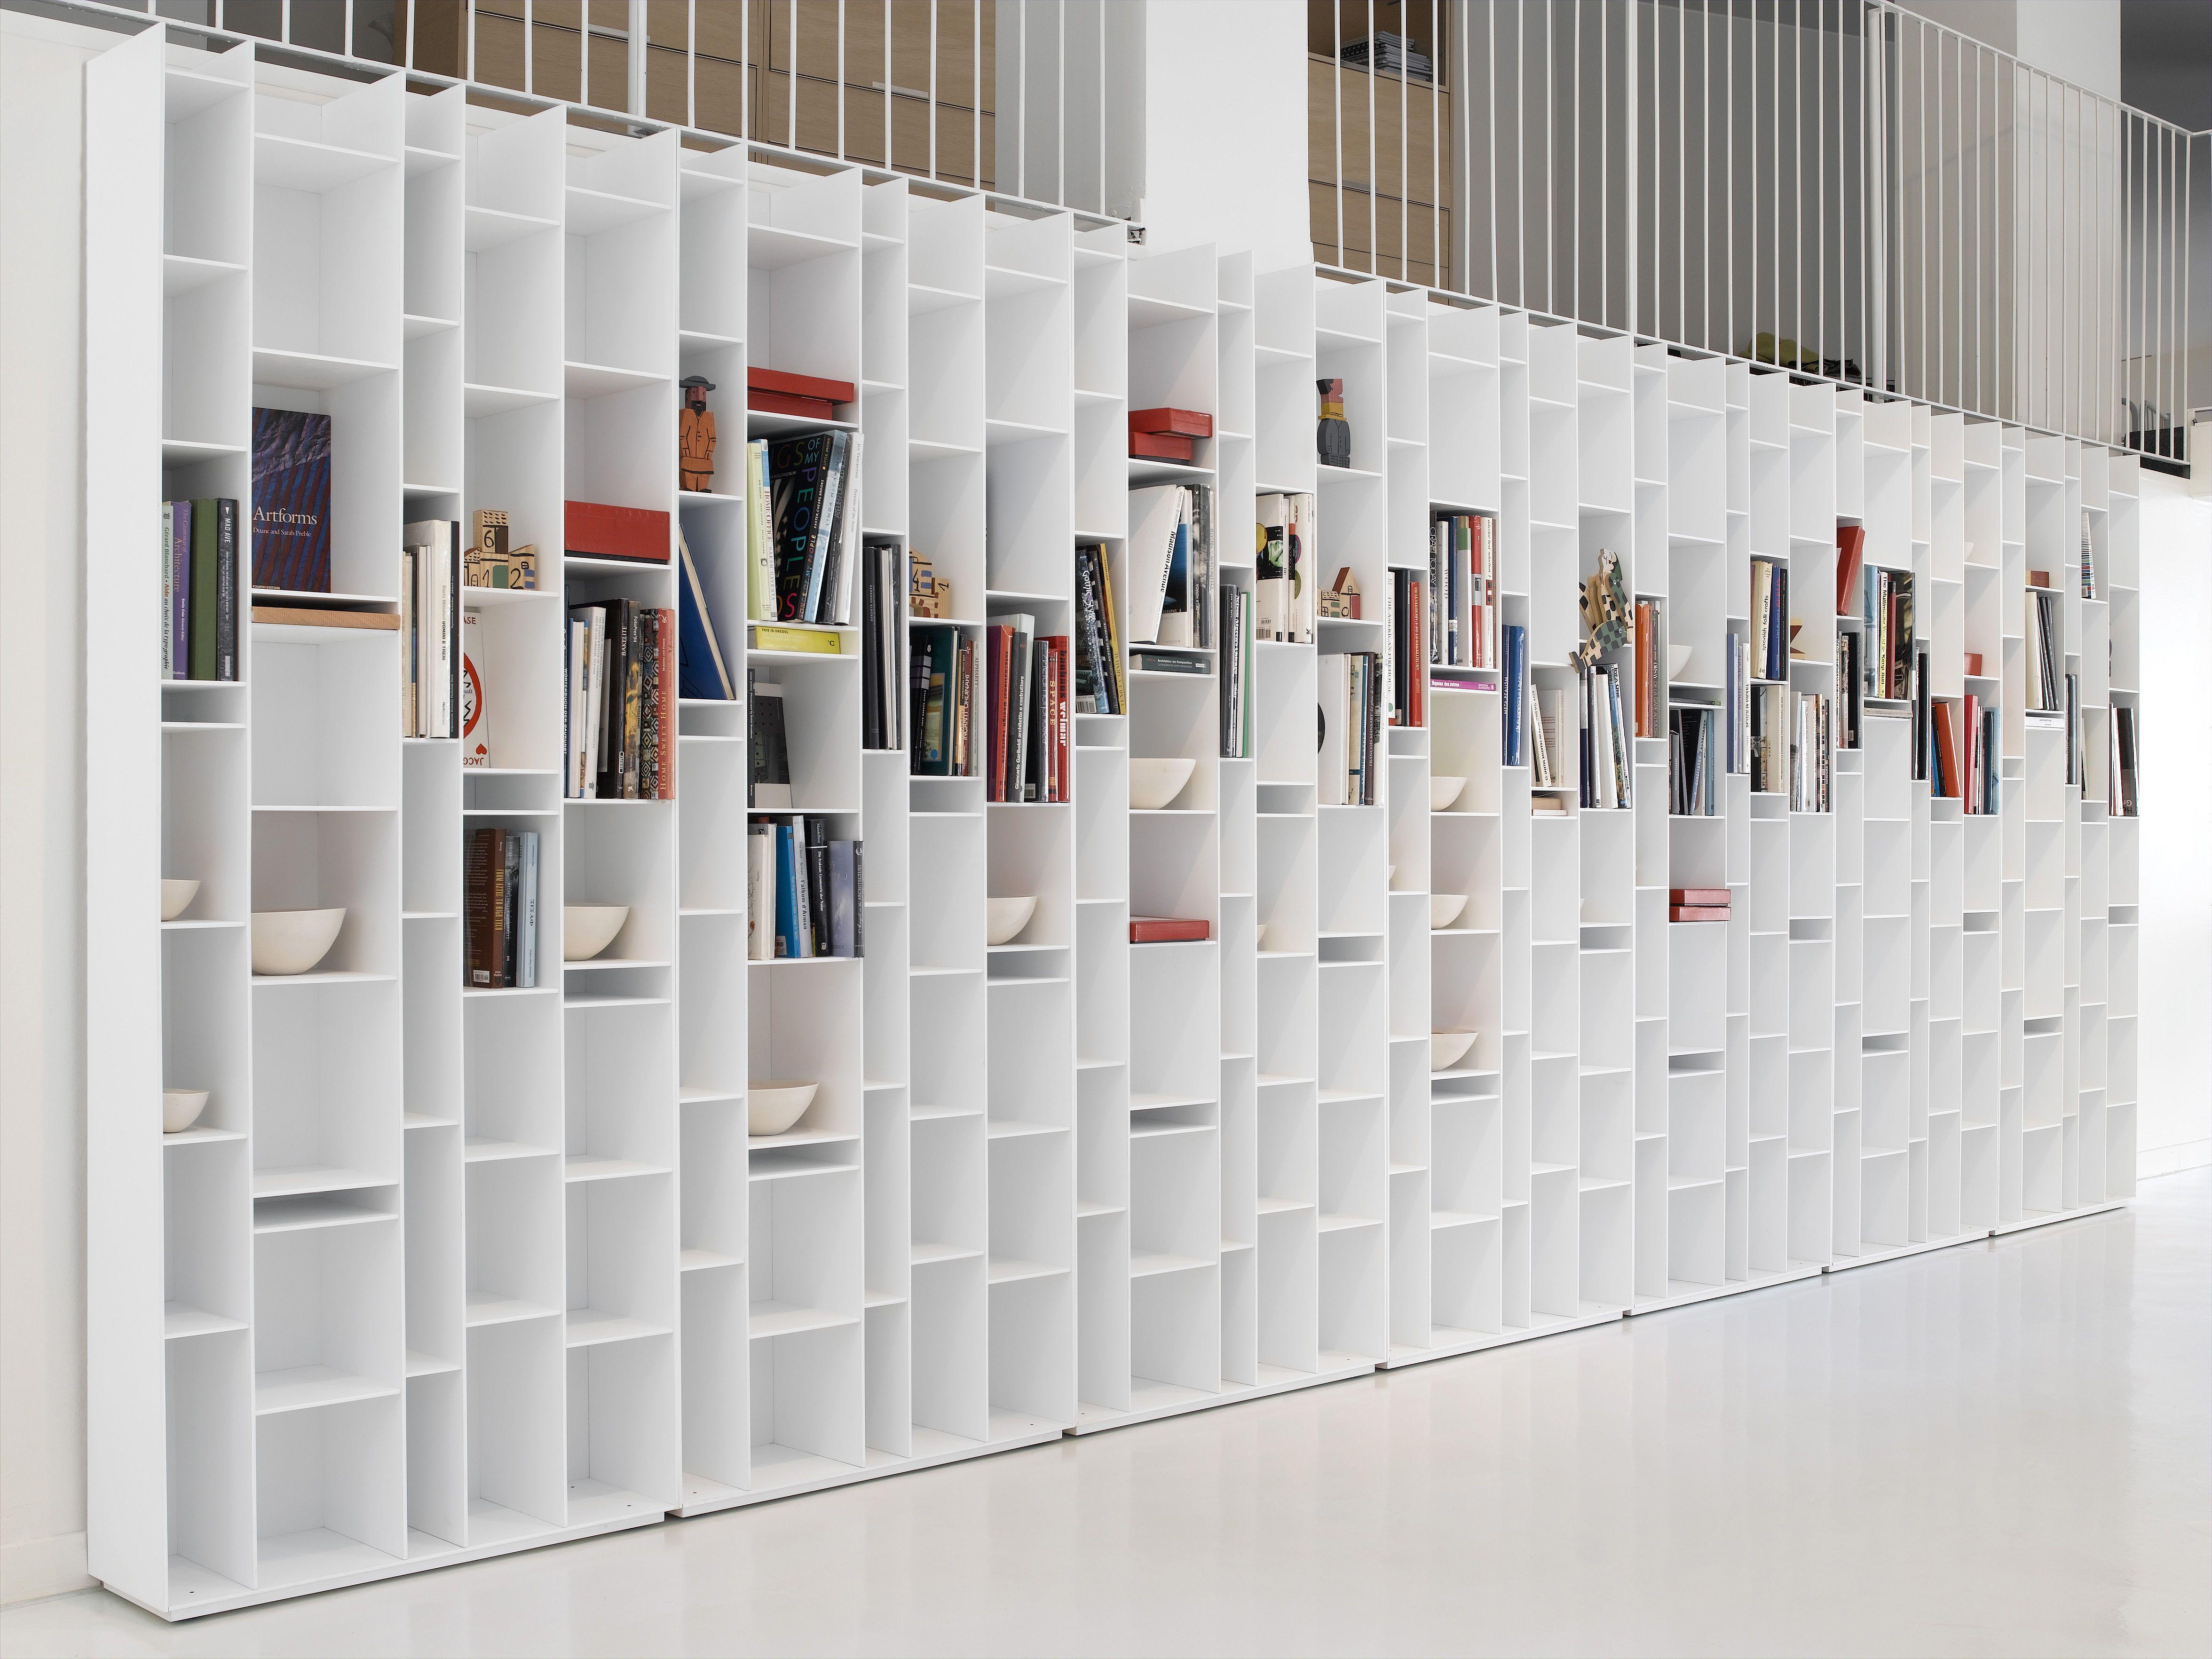 Bibliothèque Random Blanc Laqué Mdf Italia Décoration Et Mobilier Design Avec Made In